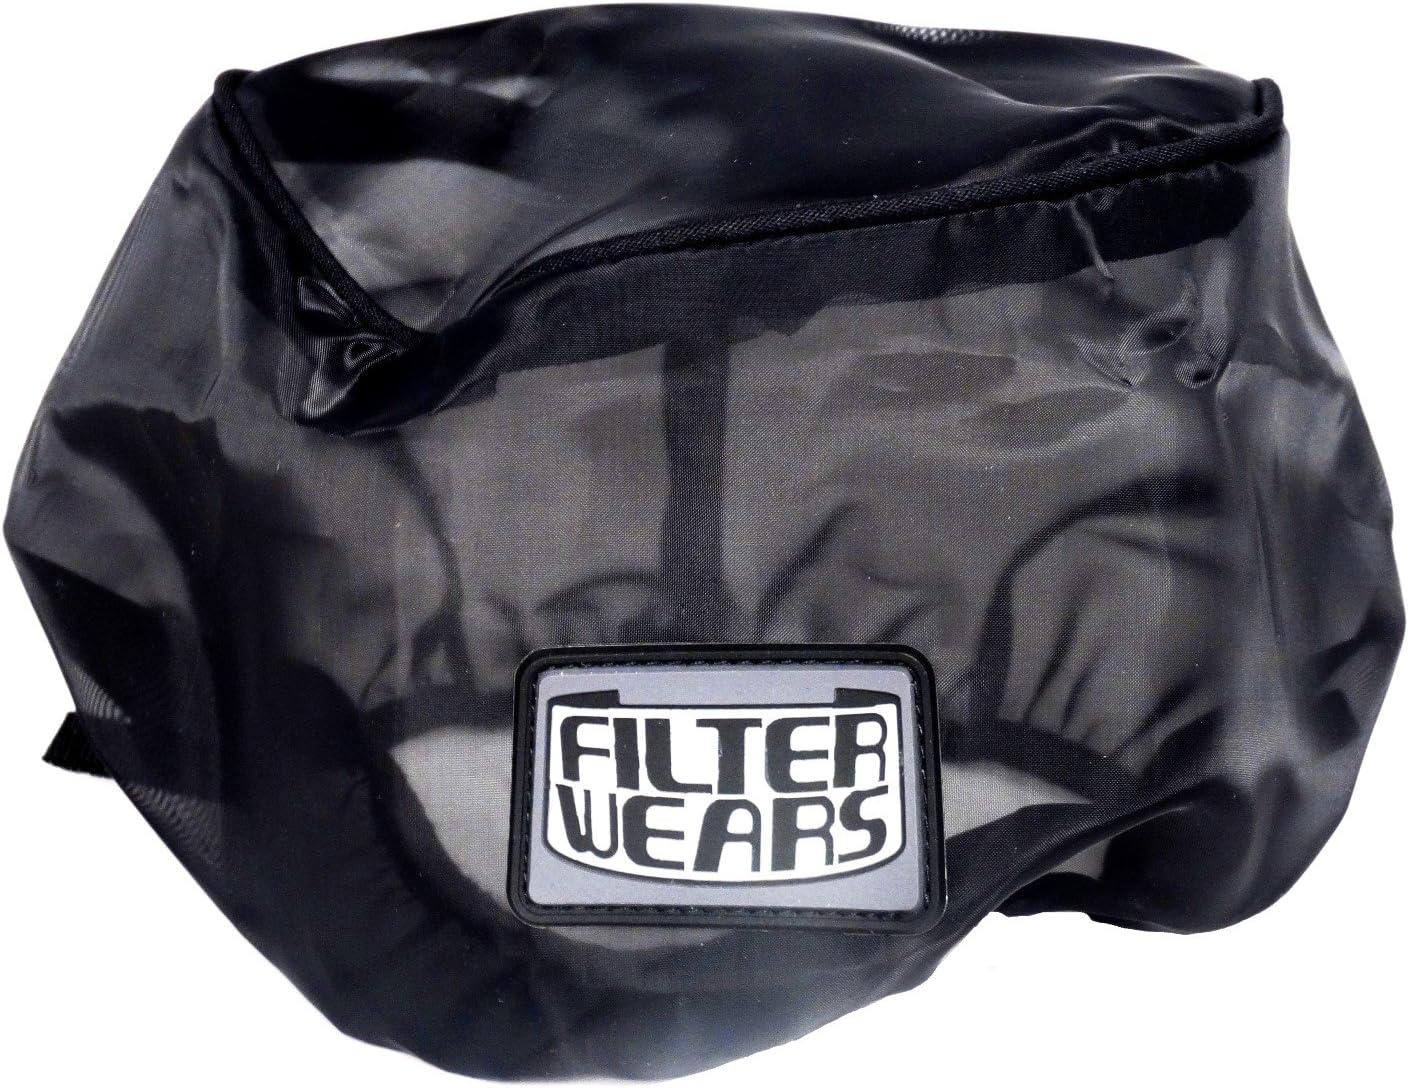 22-8036 Filter Wrap FILTERWEARS Pre-Filter K151K For K/&N Air Filter RF-1009 RU-4600